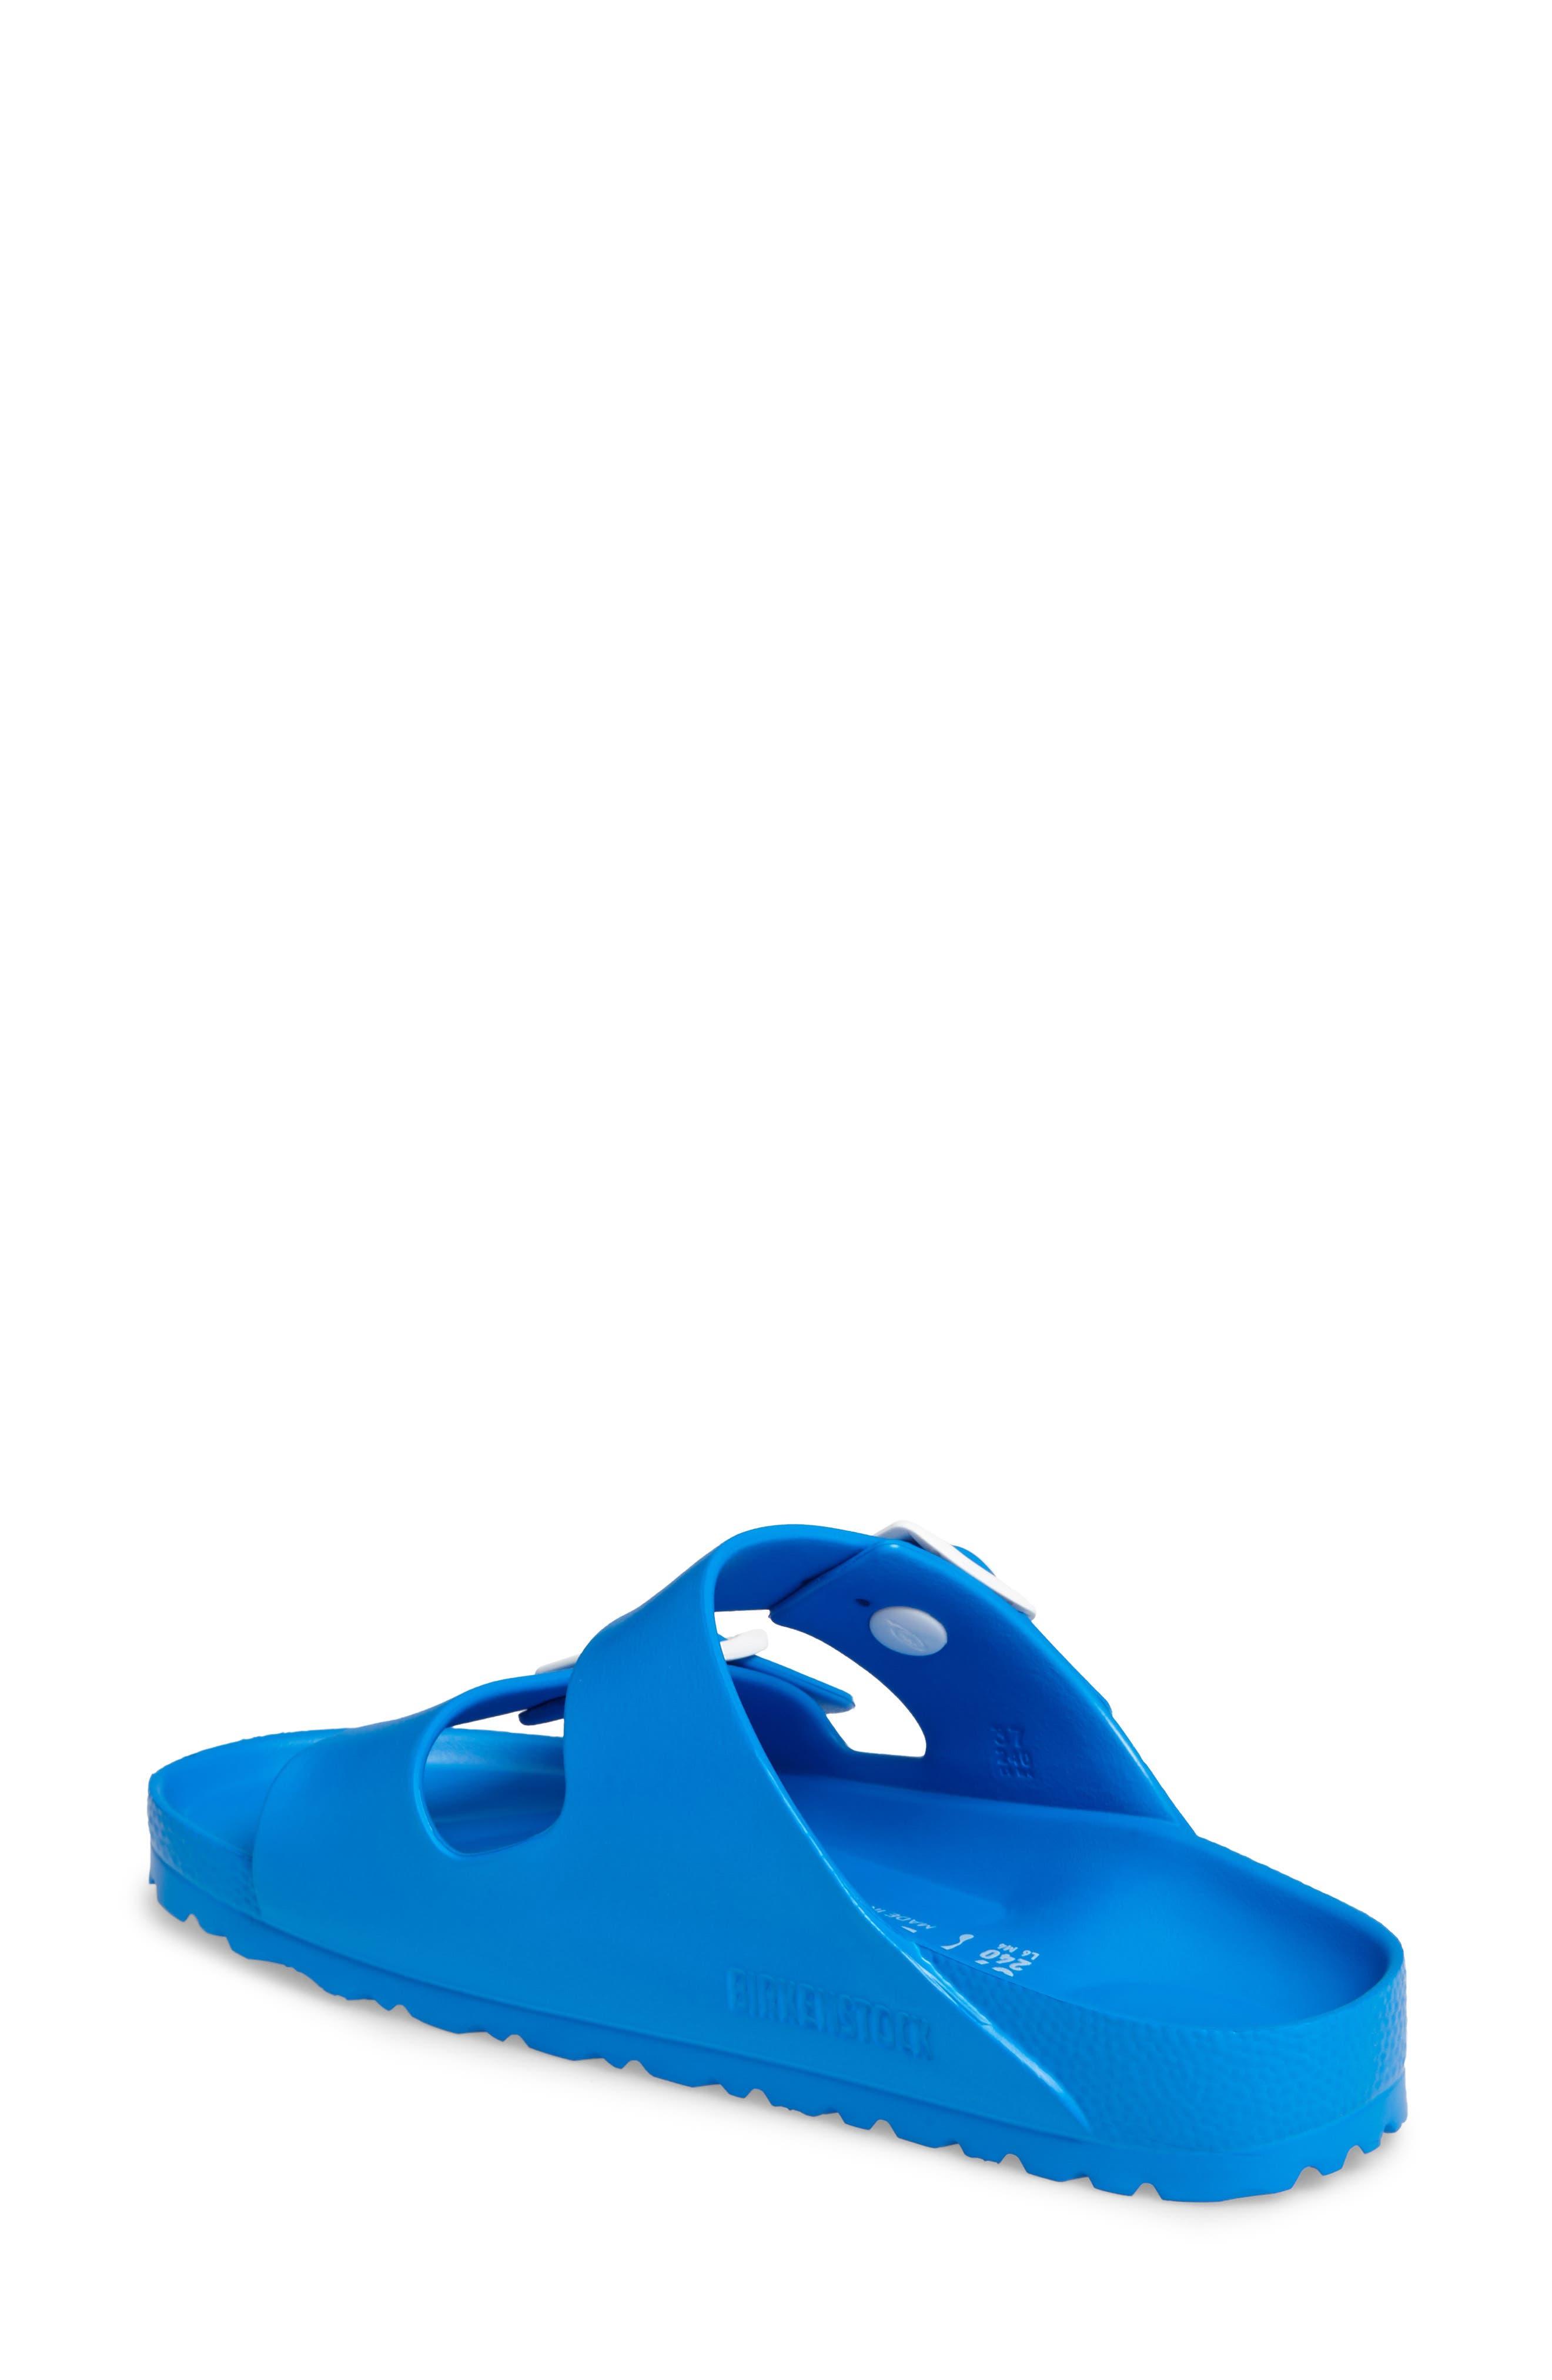 5f06e0ca9c14 Blue Birkenstock Sandals